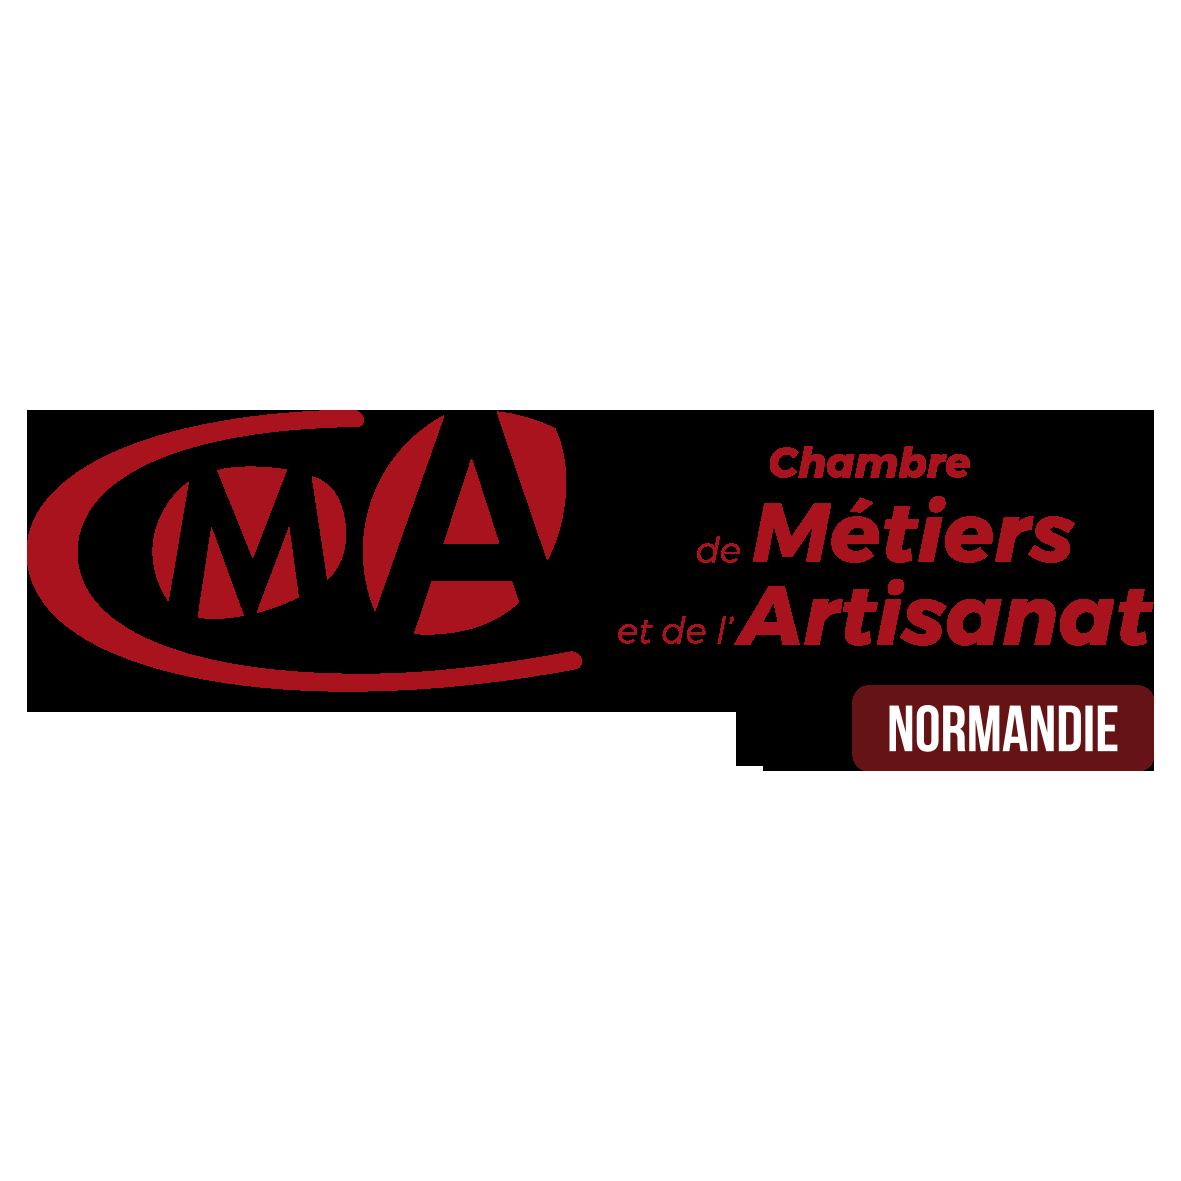 logo-crma-Normandie-numerique-HD-RVB-rouge04